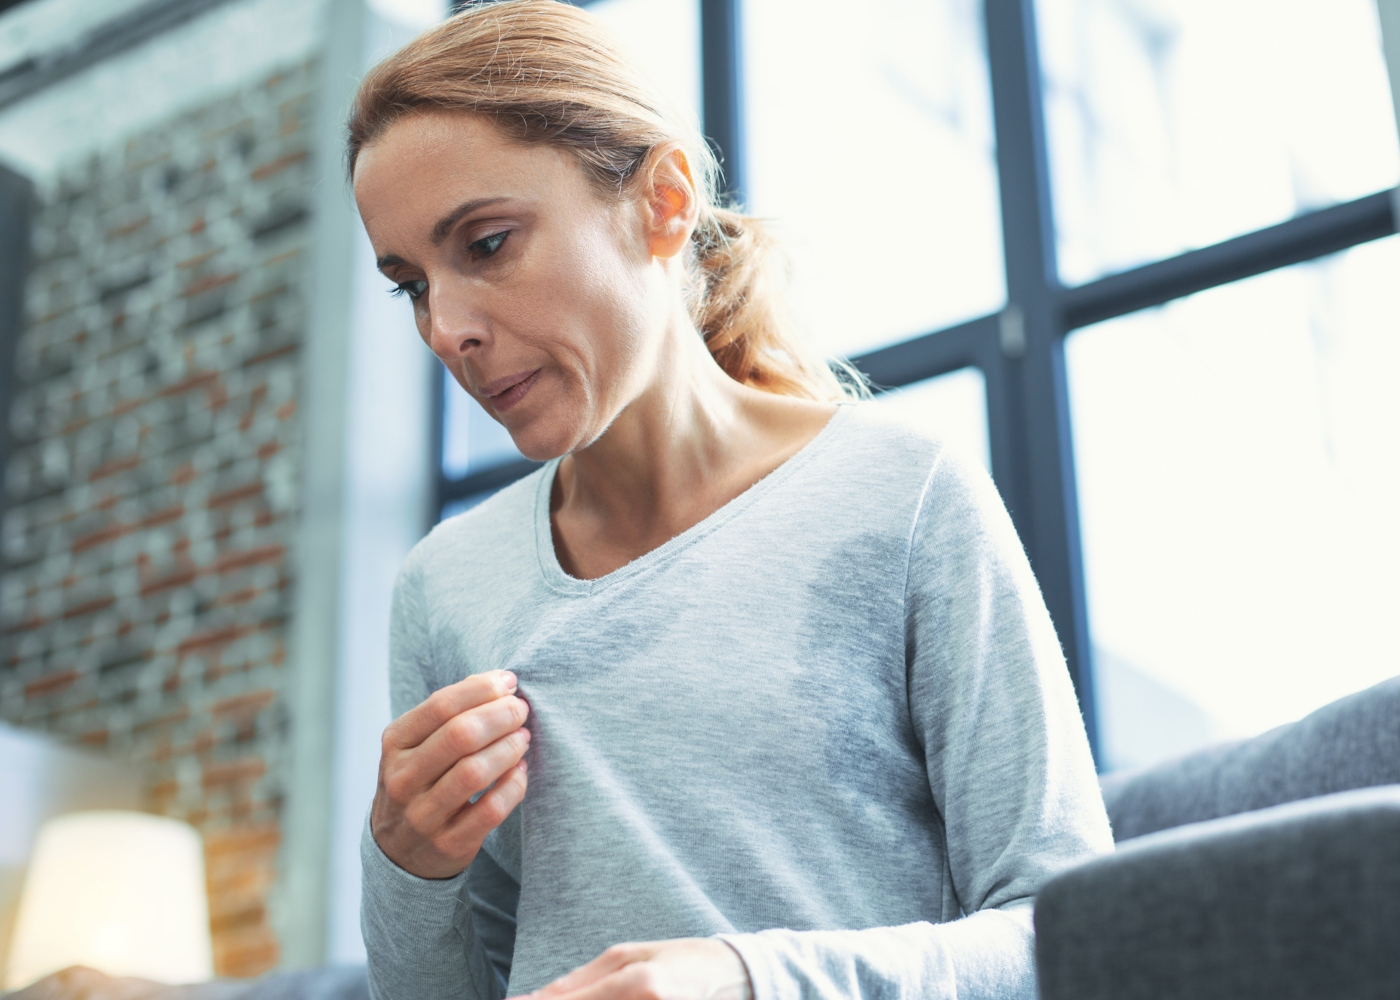 Jovem mulher com sintomas de menopausa precoce